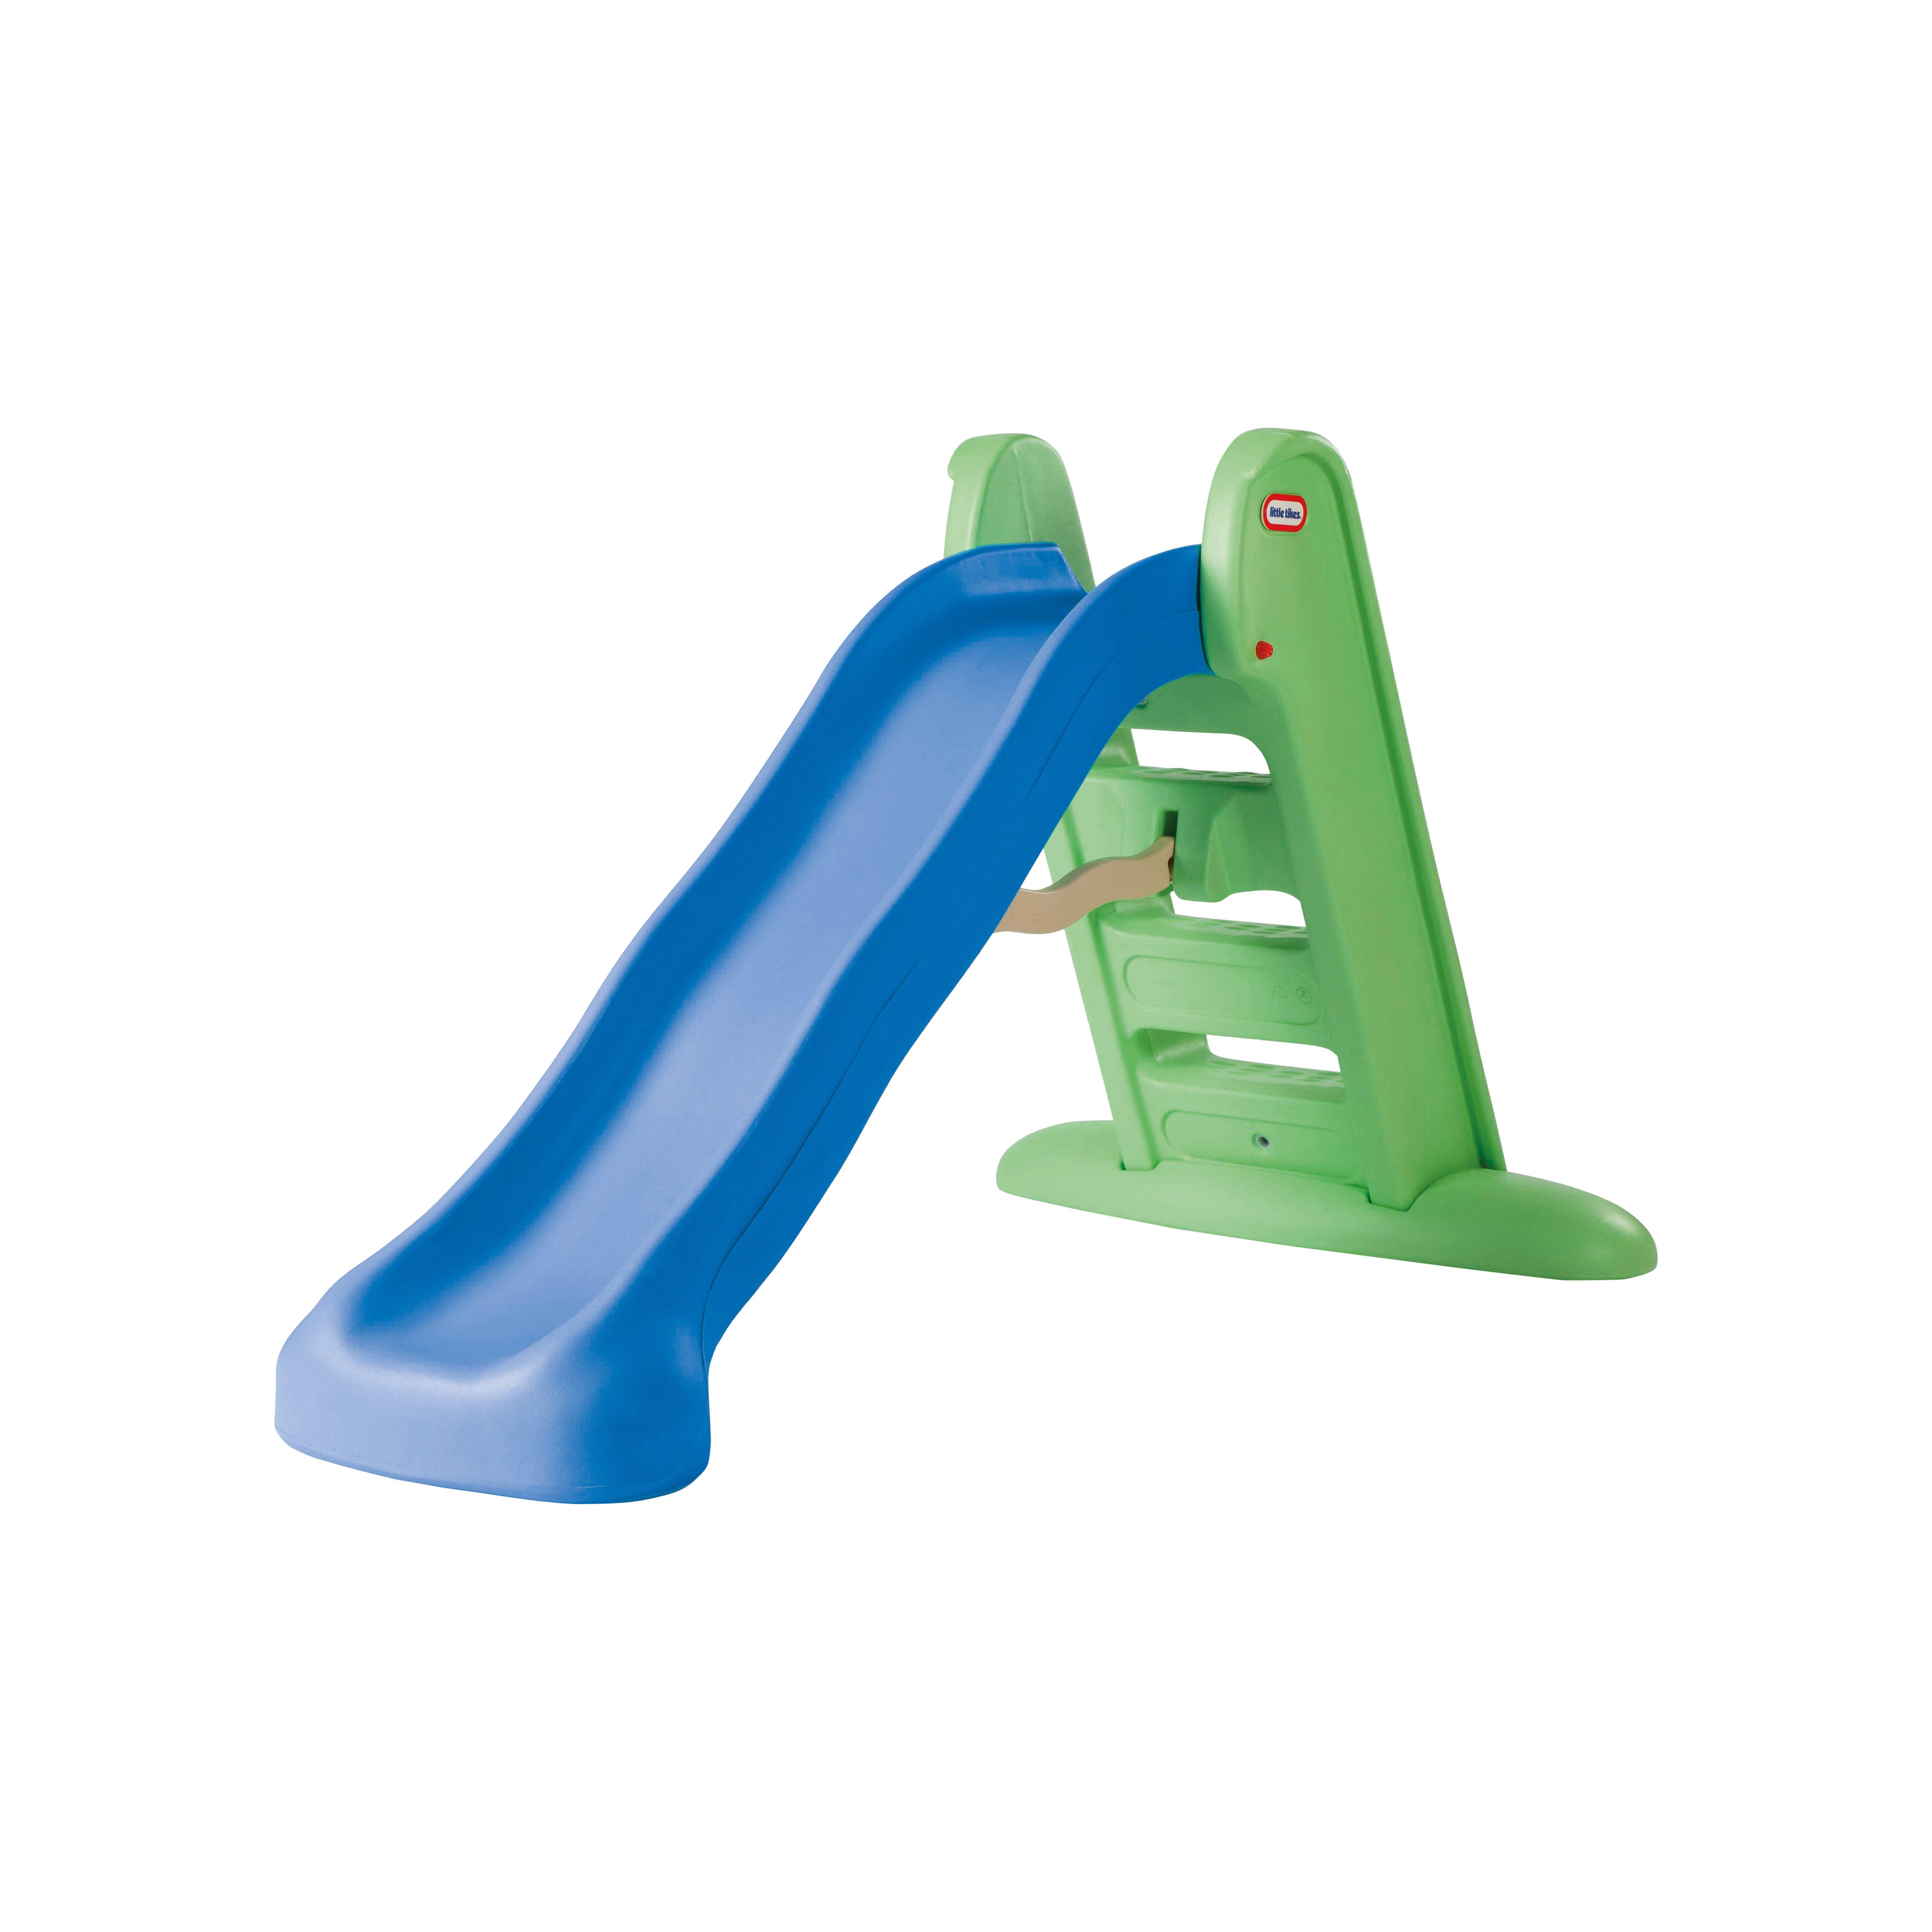 Little Tikes Easy Store Large Slide & Reviews | Wayfair